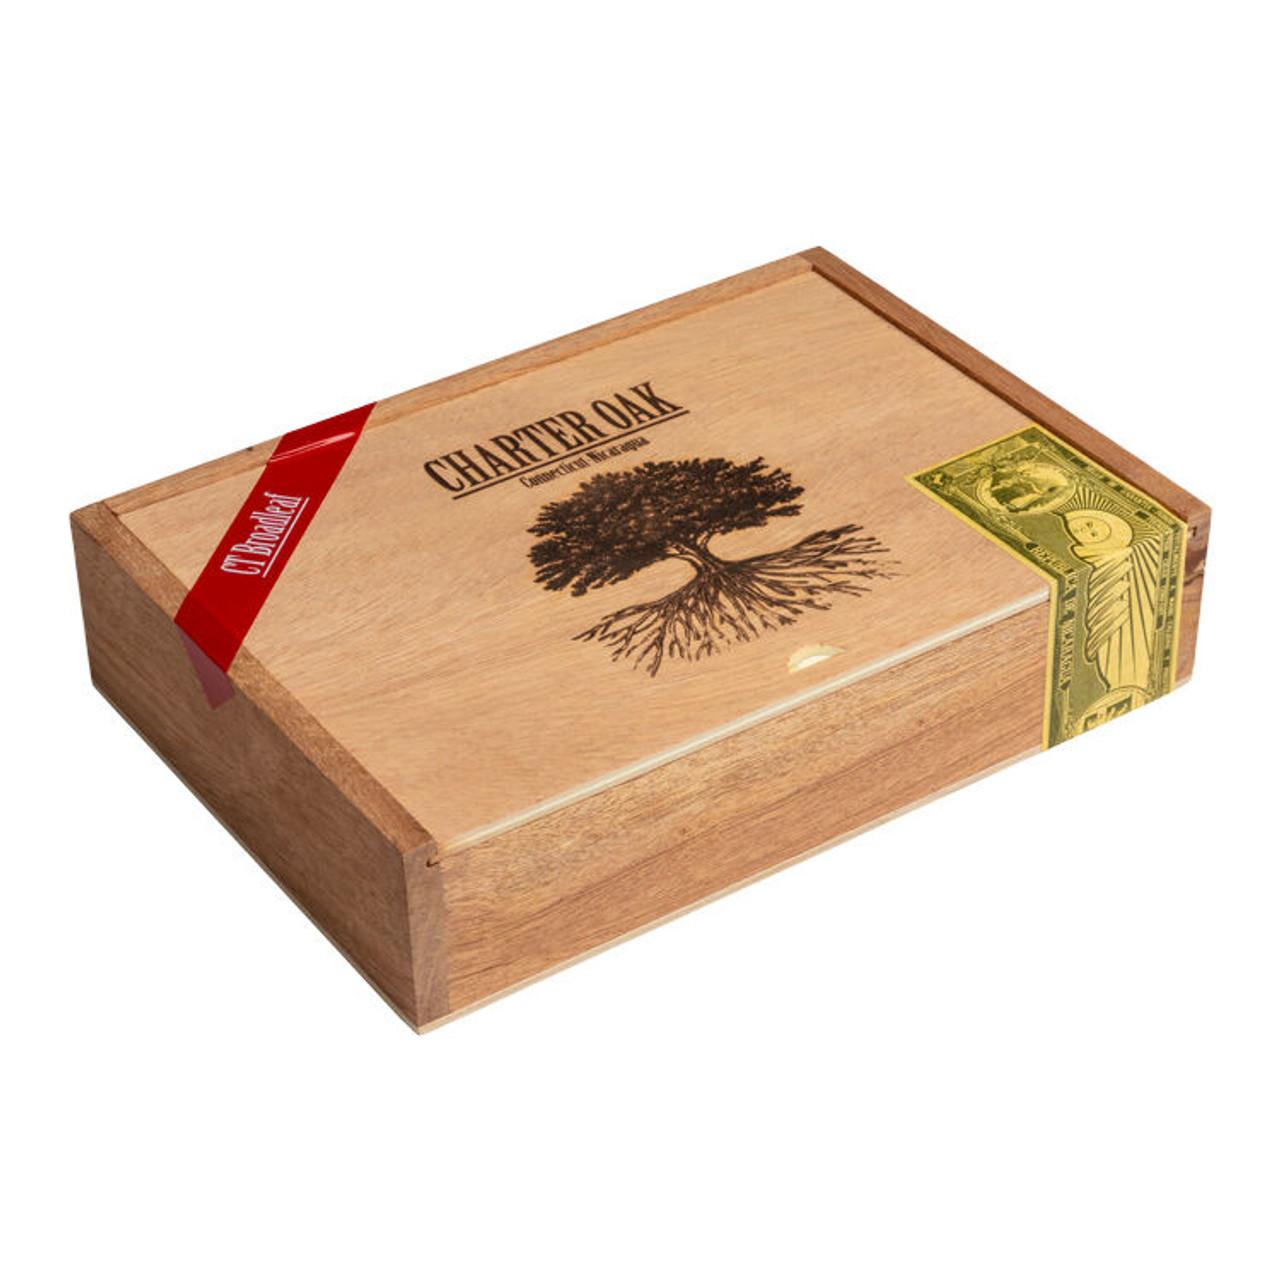 Foundation Charter Oak Rothschild Maduro Cigars - 4.5 x 50 (Box of 20)